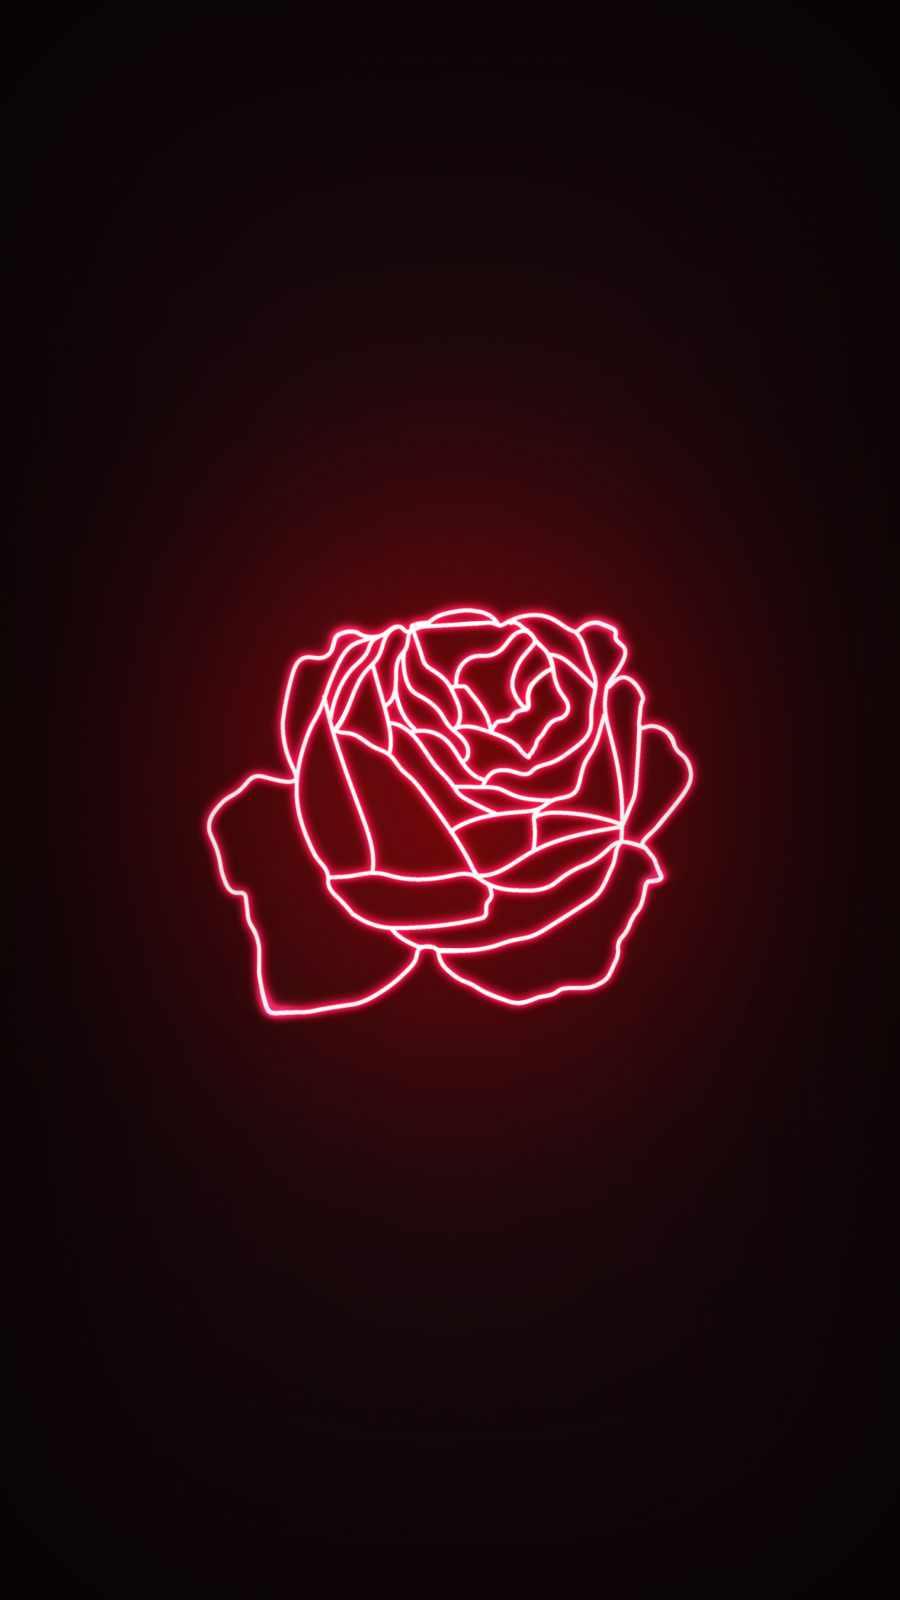 Neon Rose iPhone Wallpaper